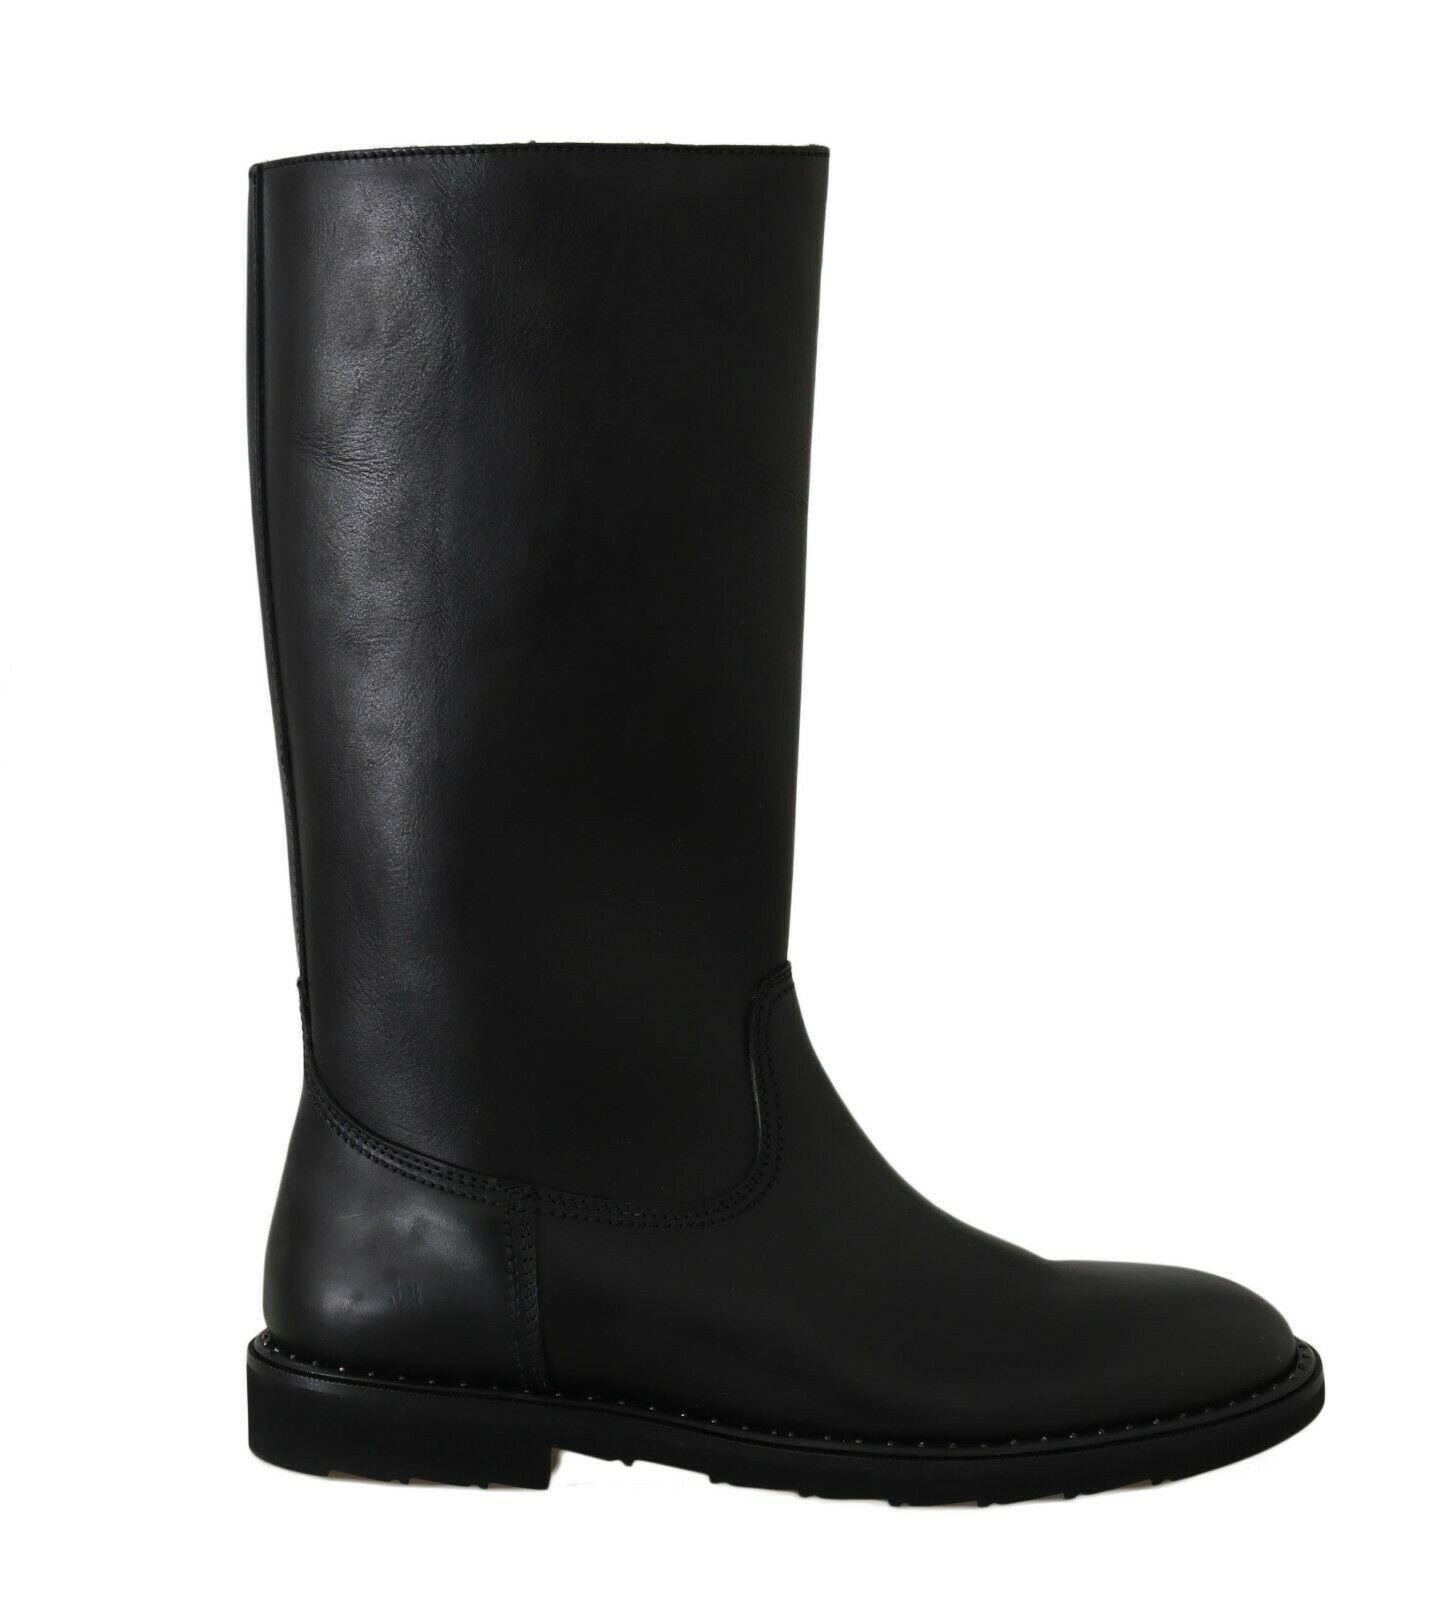 Dolce & Gabbana Men's Leather Knee High Winter Boots Black MV2193 - EU44/US11